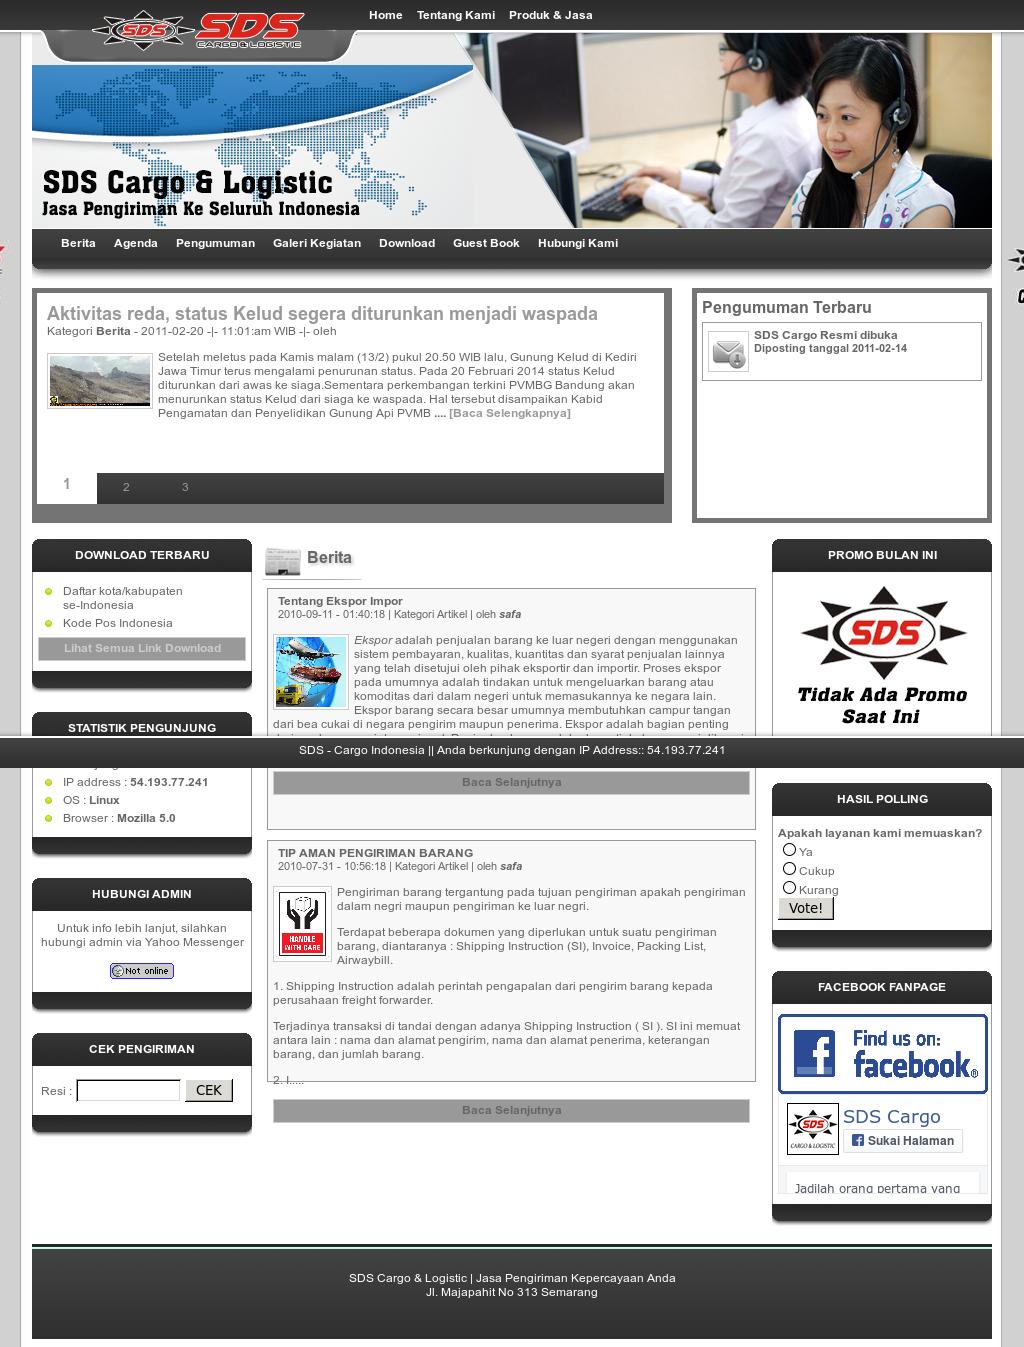 Sds Cargo Competitors Revenue And Employees Owler Company Profile 1 Cek Status